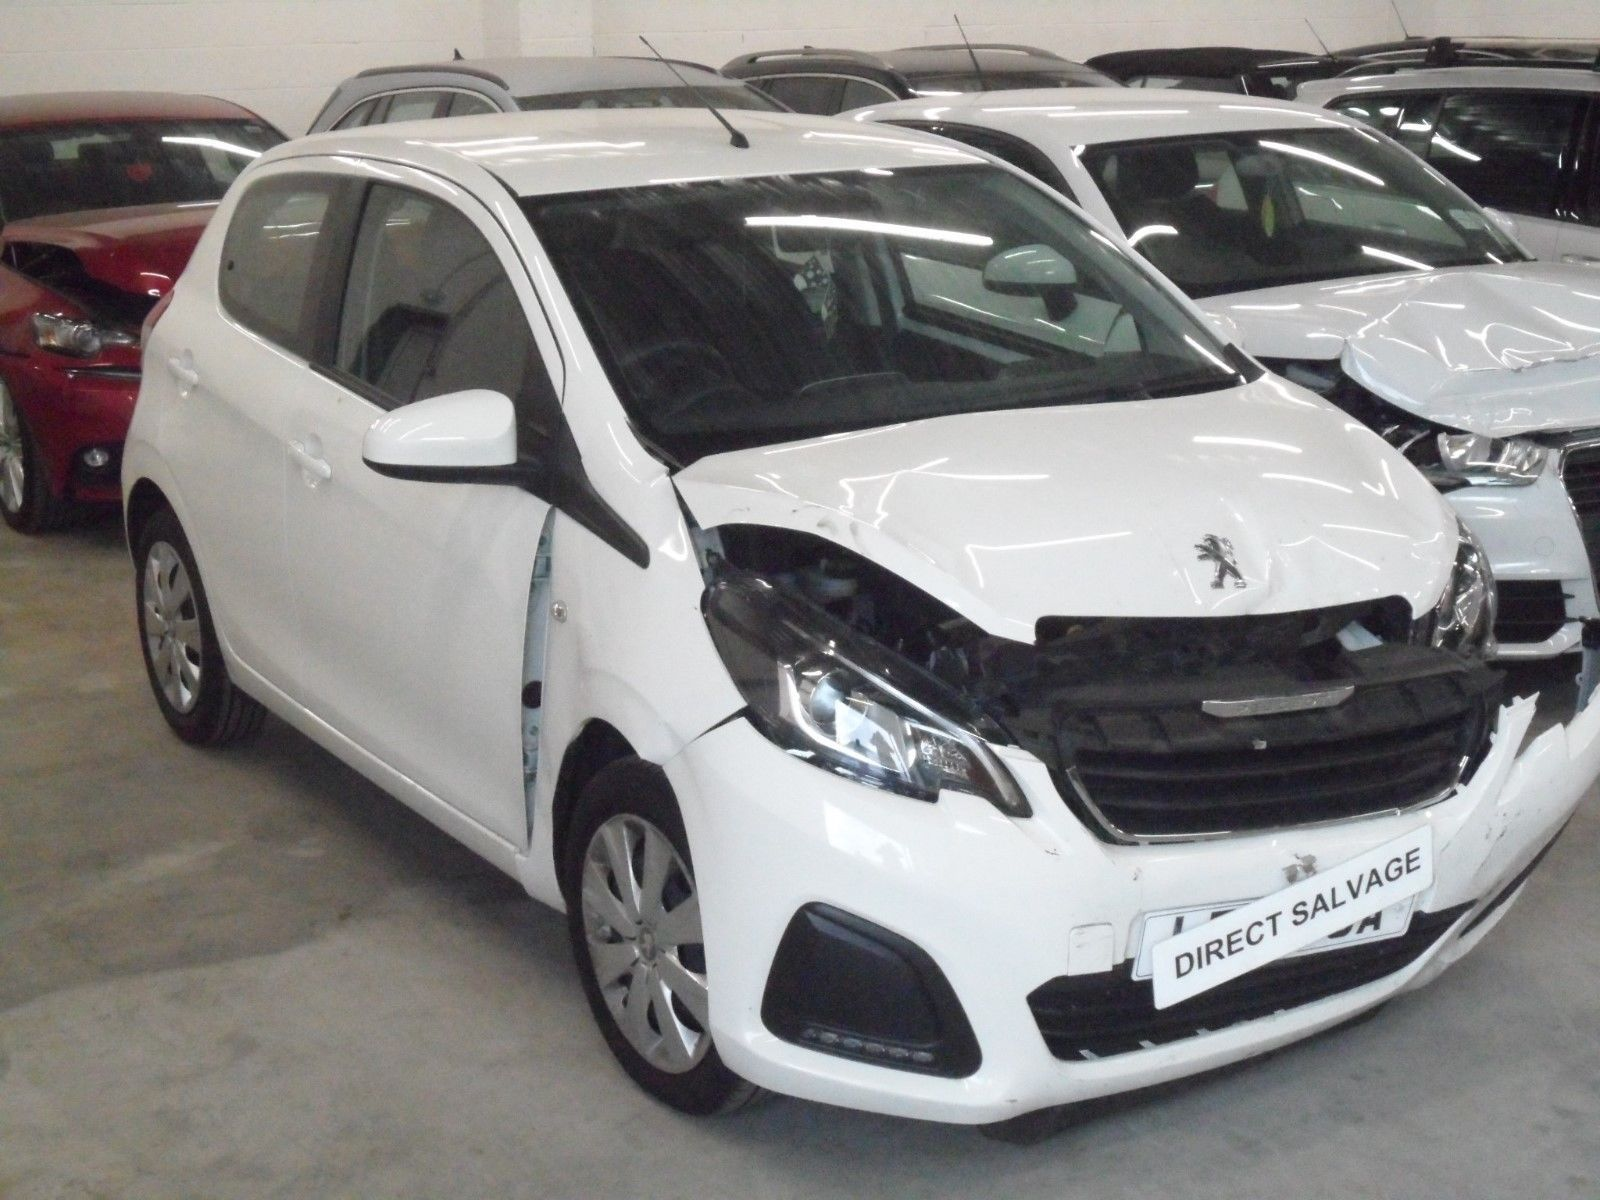 Ebay 2017 17 Reg Peugeot 108 Active White 1 0 Petrol Salvage